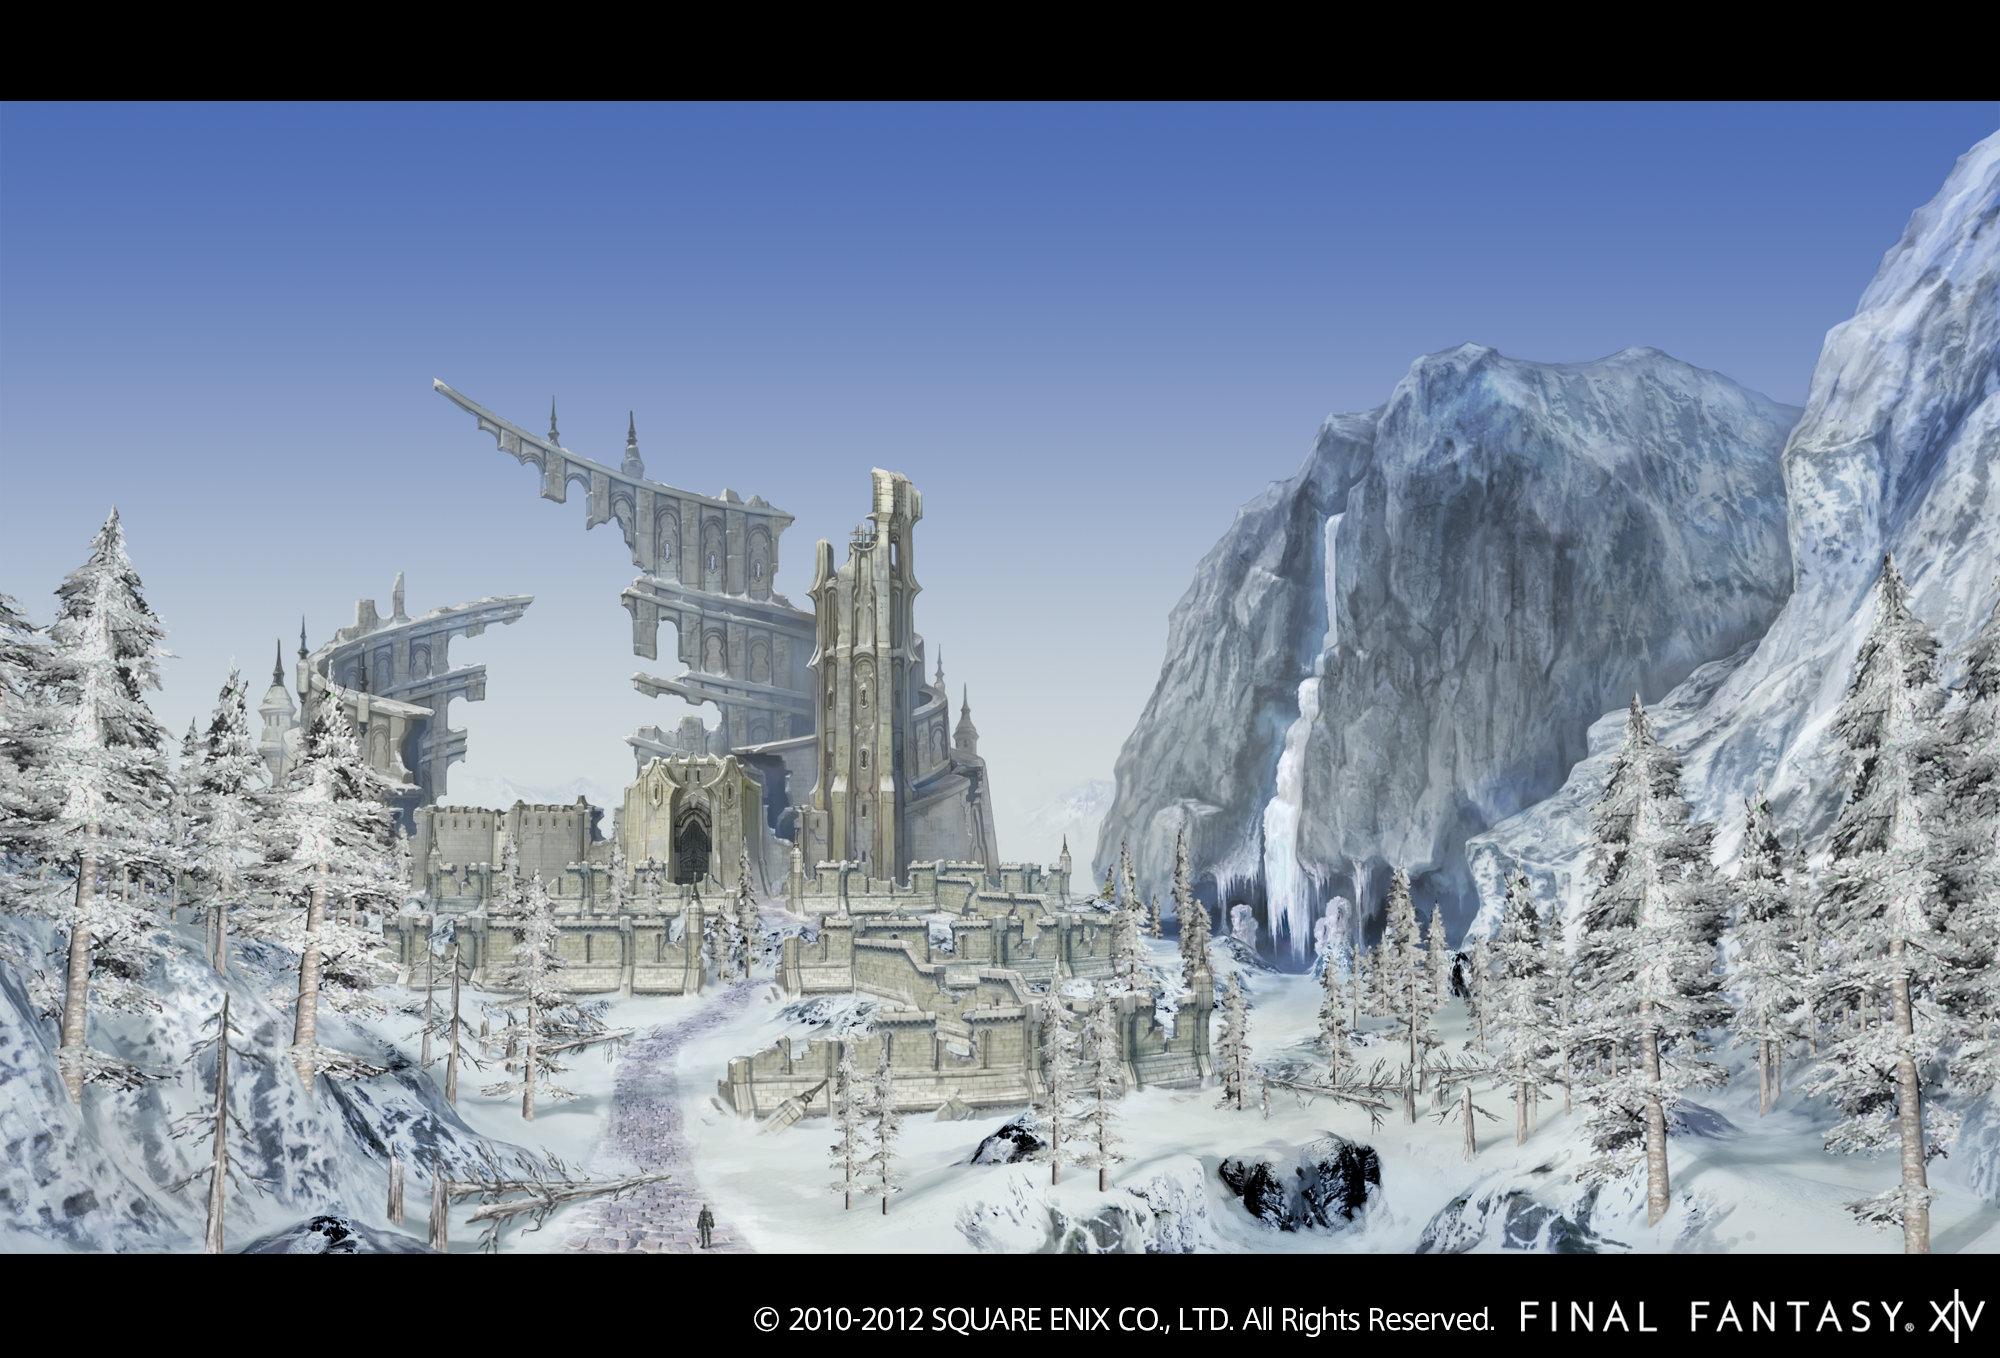 Fantasy XIV A Realm Reborn Computer Wallpapers Desktop Backgrounds 2000x1358